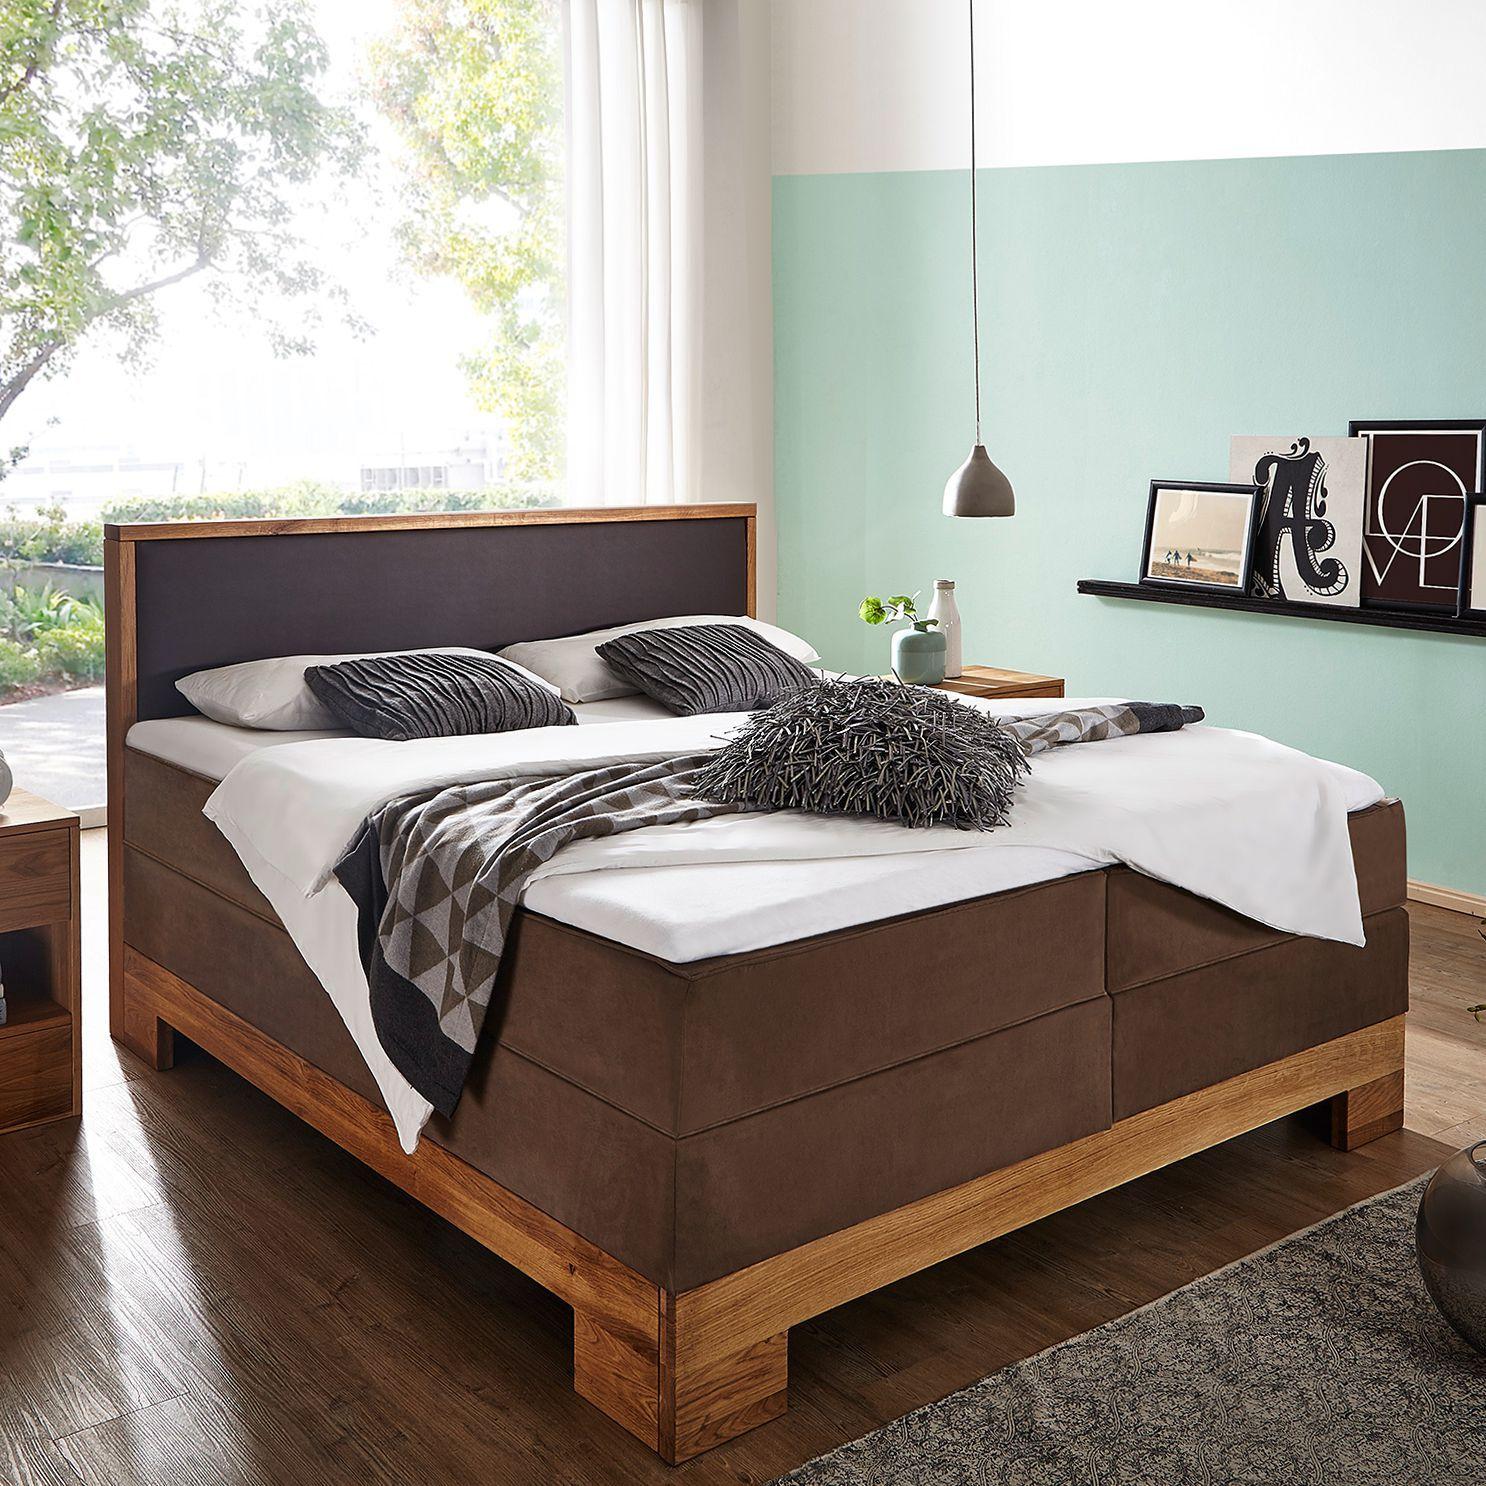 Full Size of Weies Bett 200x200 Mit Bettkasten 180x200 Holz Flexa Betten Frankfurt Massivholz Düsseldorf Trends Möbel Boss Dänisches Bettenlager Badezimmer Günstig Bett Betten 200x200